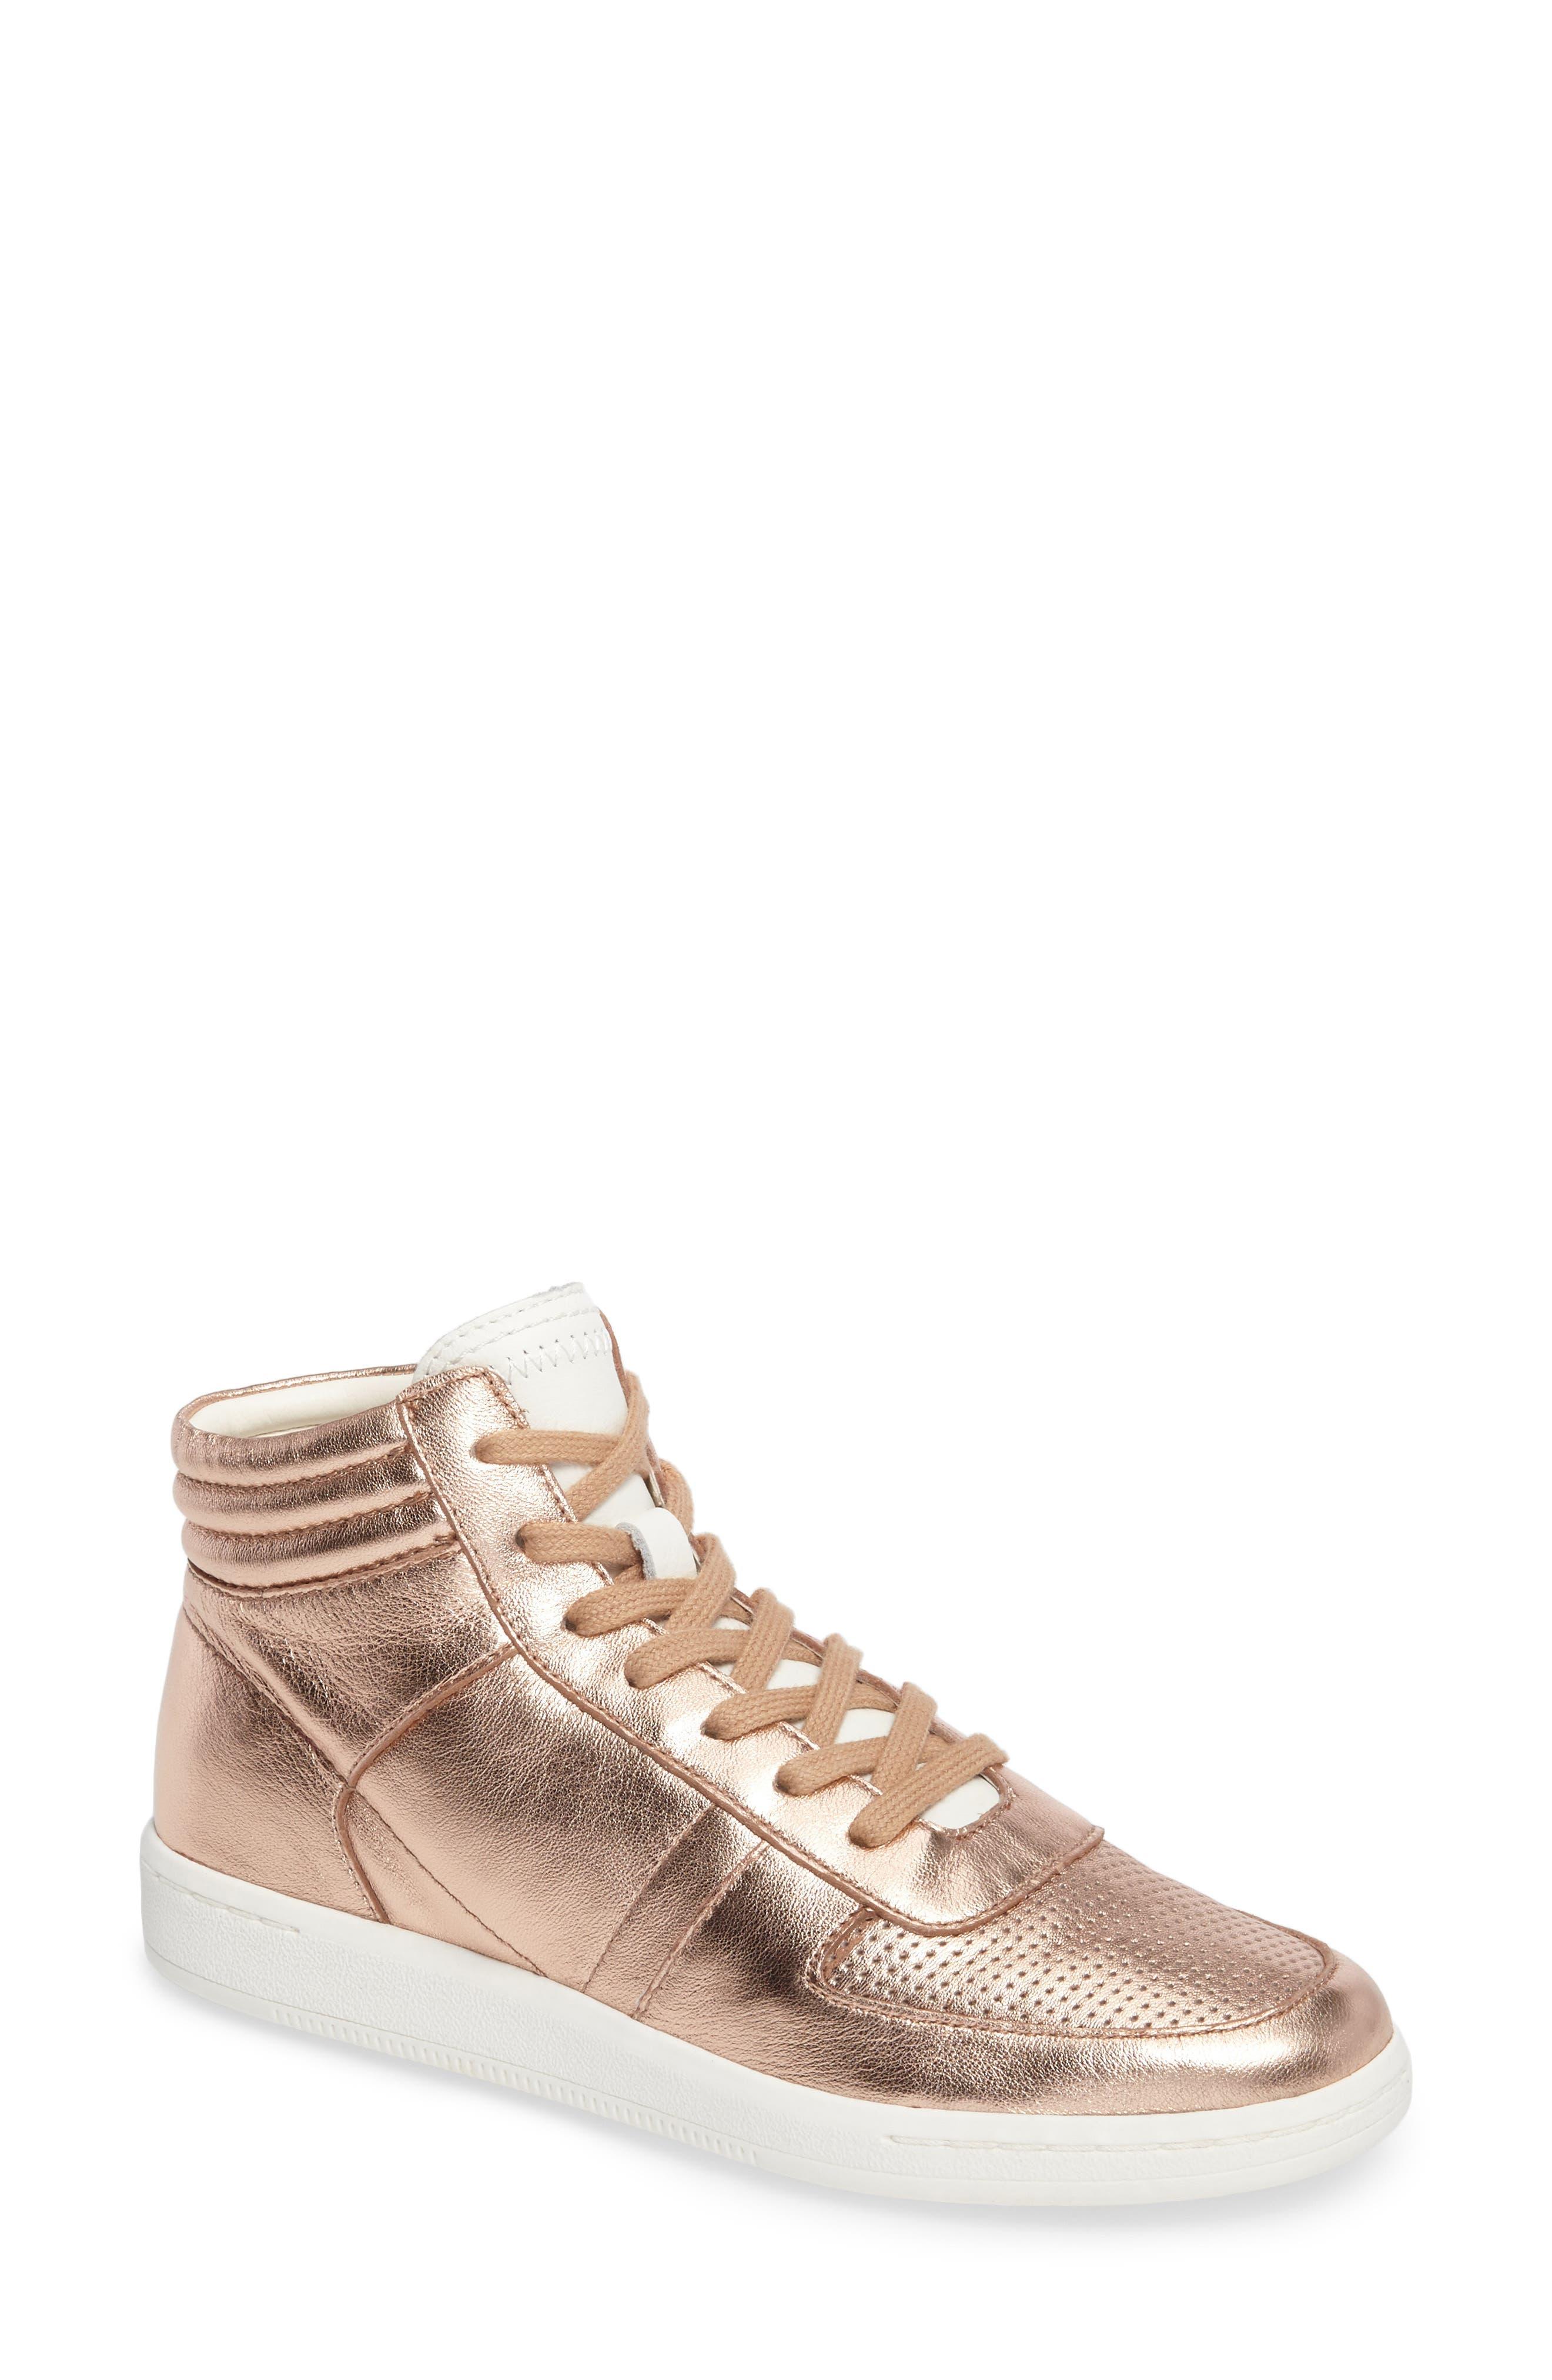 Alternate Image 1 Selected - Dolce Vita Nate High Top Sneaker (Women)